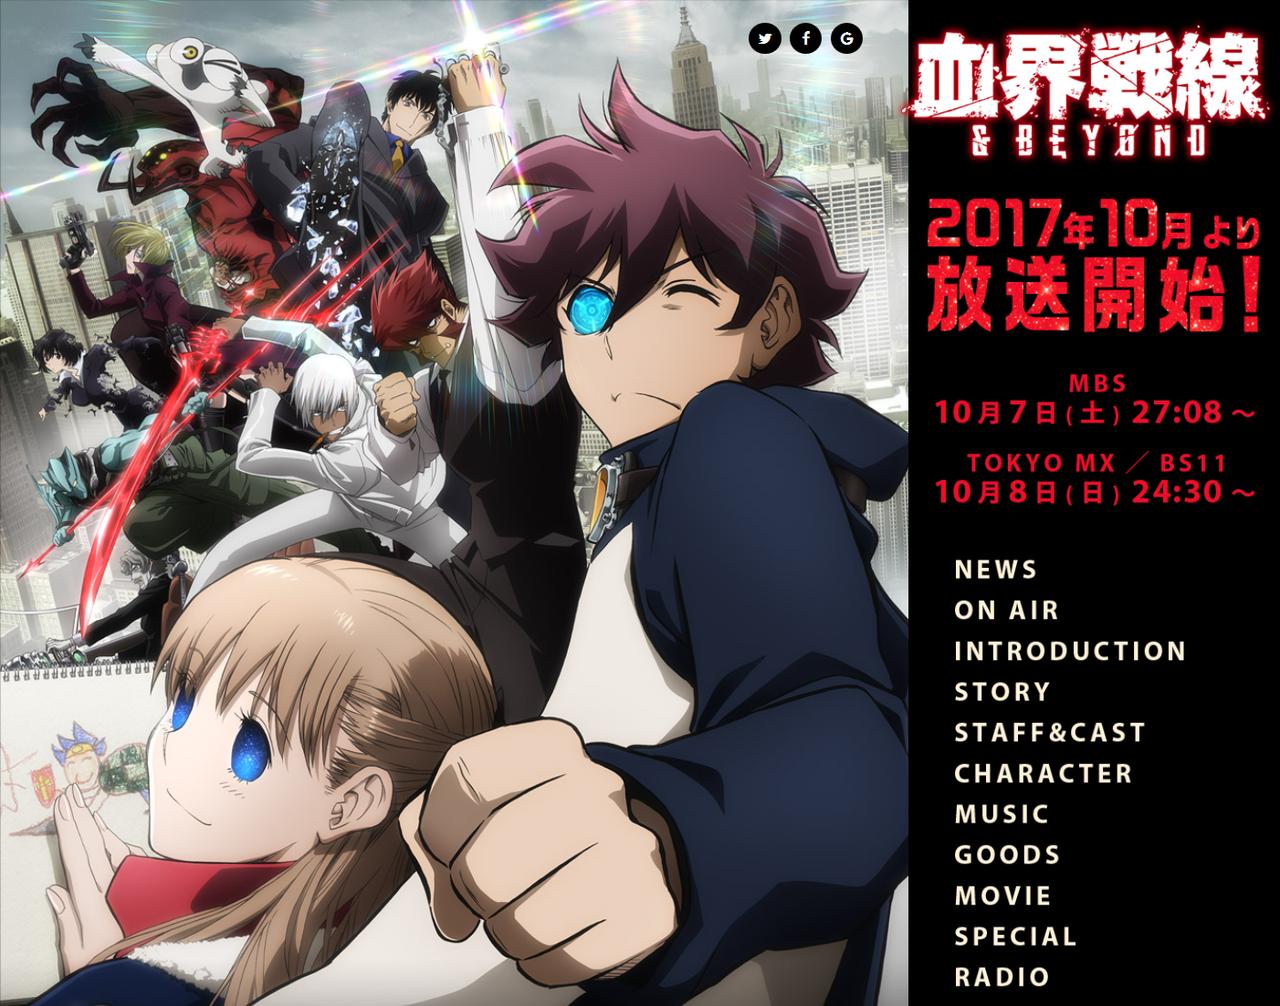 TVアニメ「血界戦線 & BEYOND」公式サイト